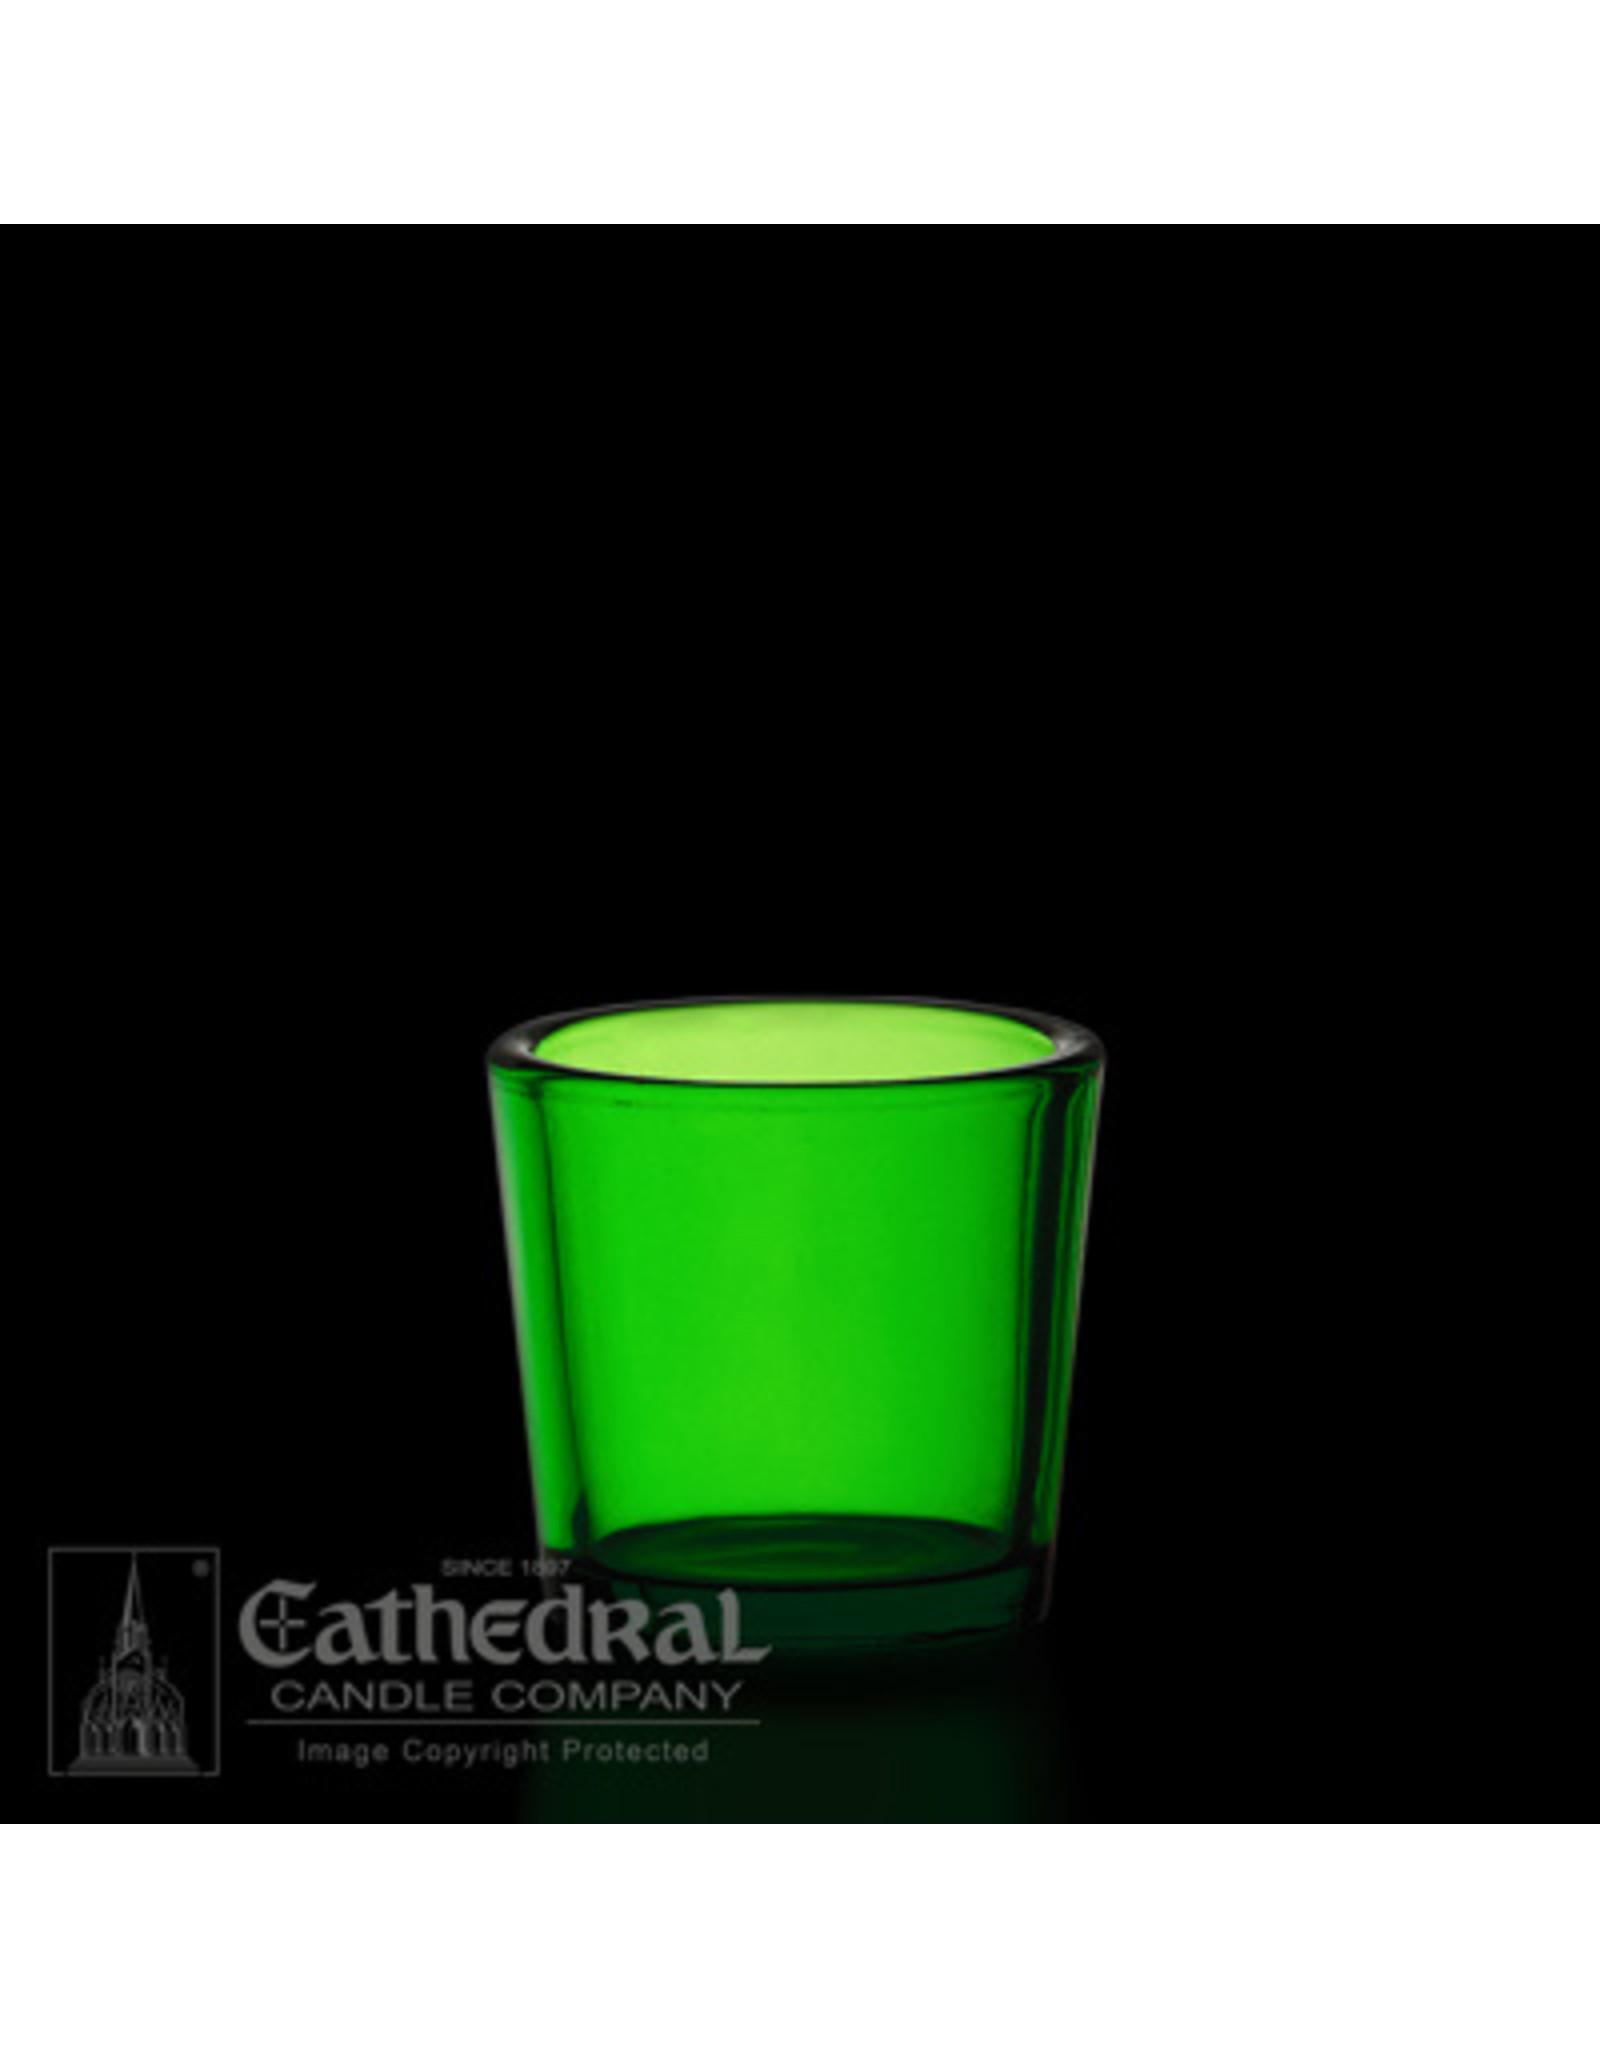 CNDL GLASS VOT 10 HR GREEN (12)